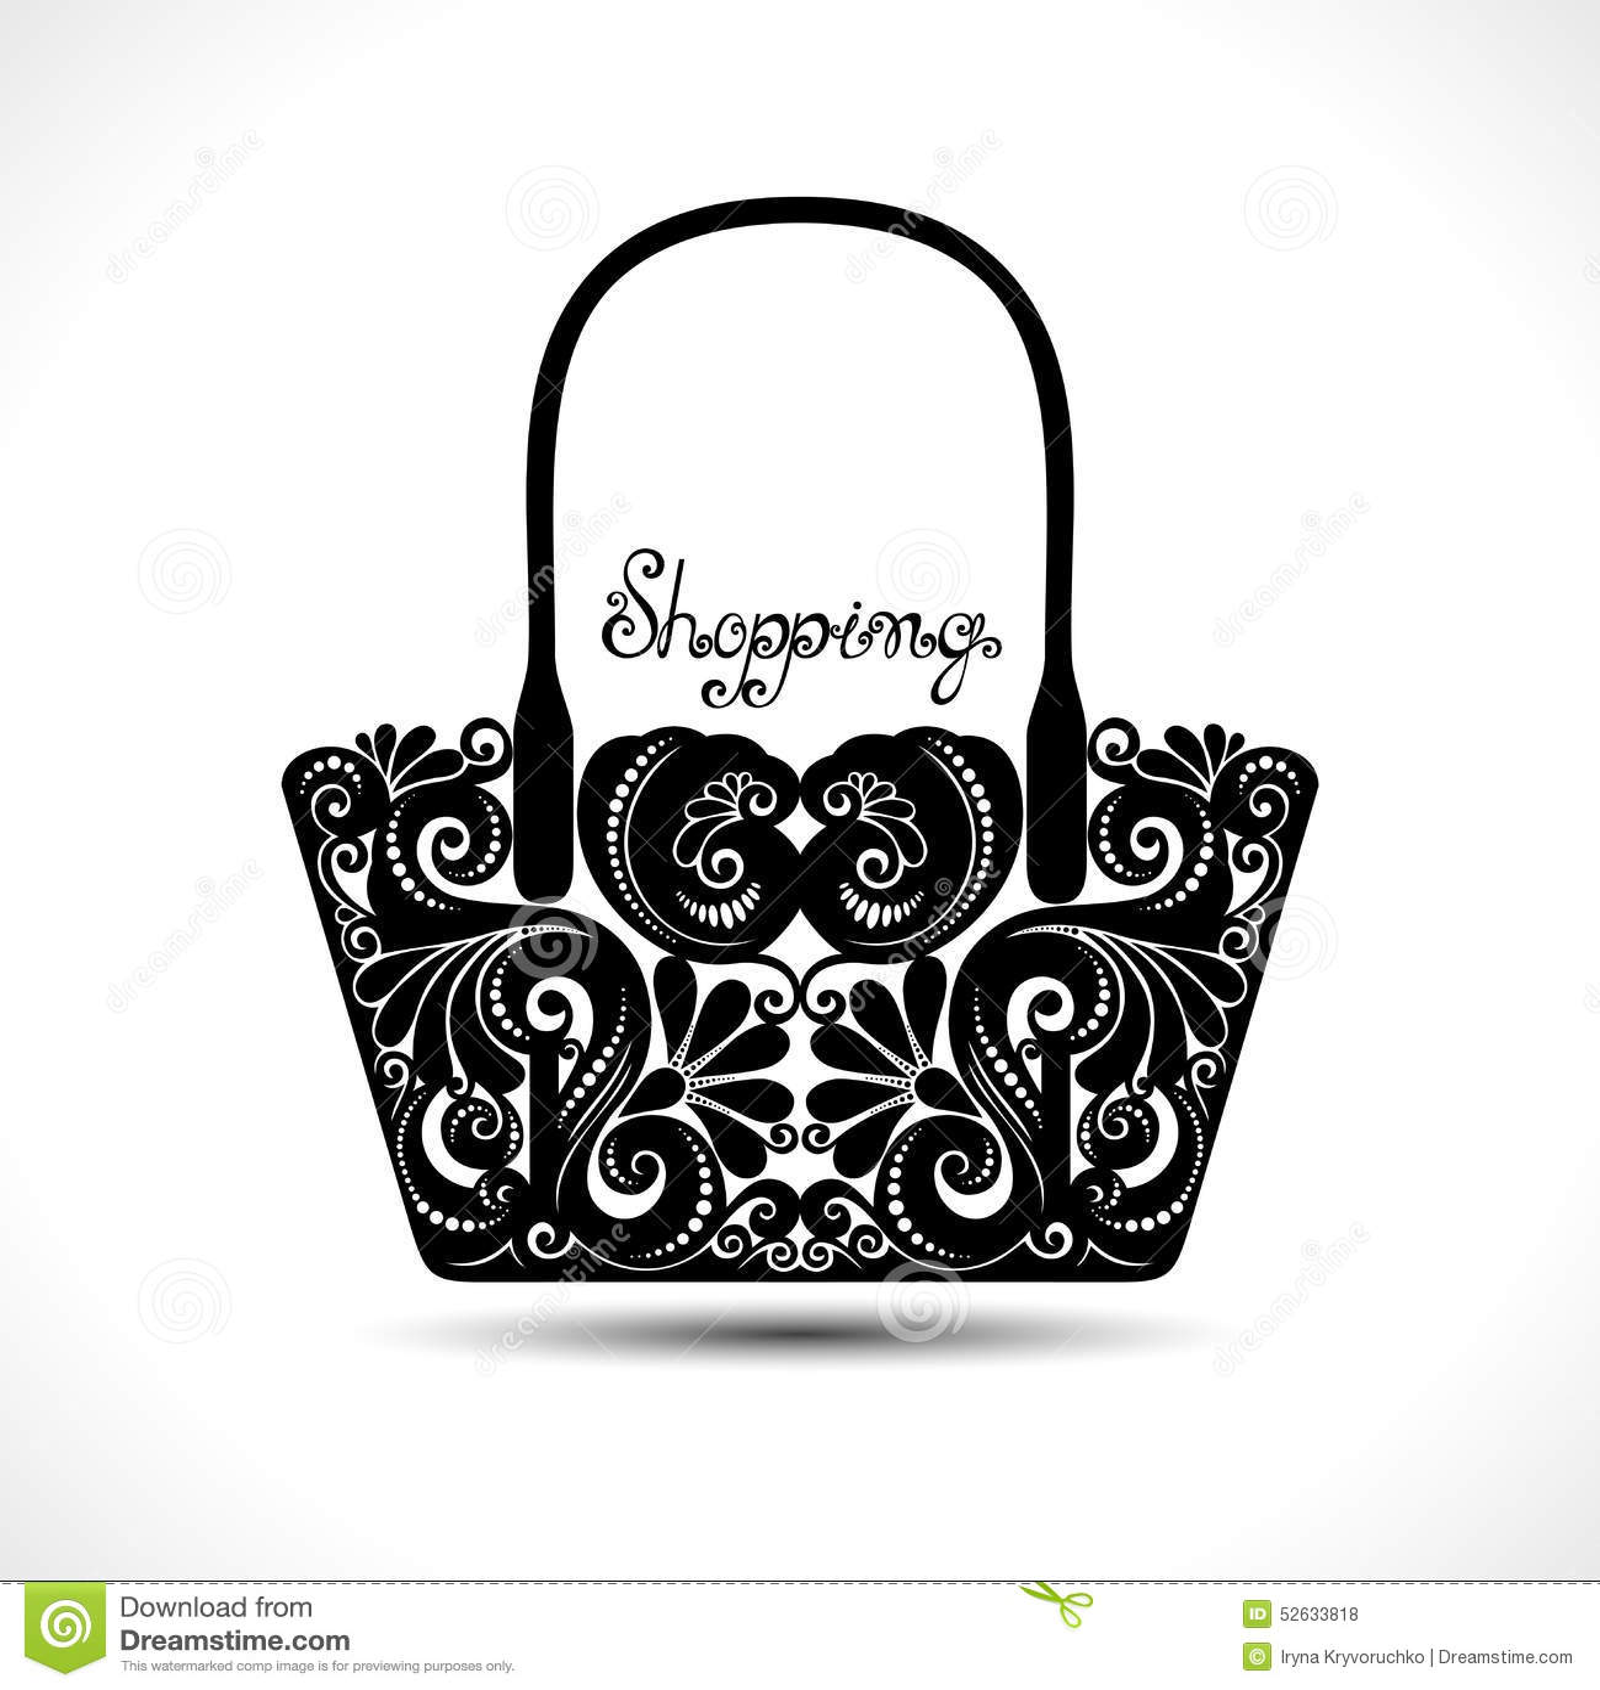 Vector Decorative Ornate Women s Bag Stock Vector - Illustration of ... d1221b6b0c